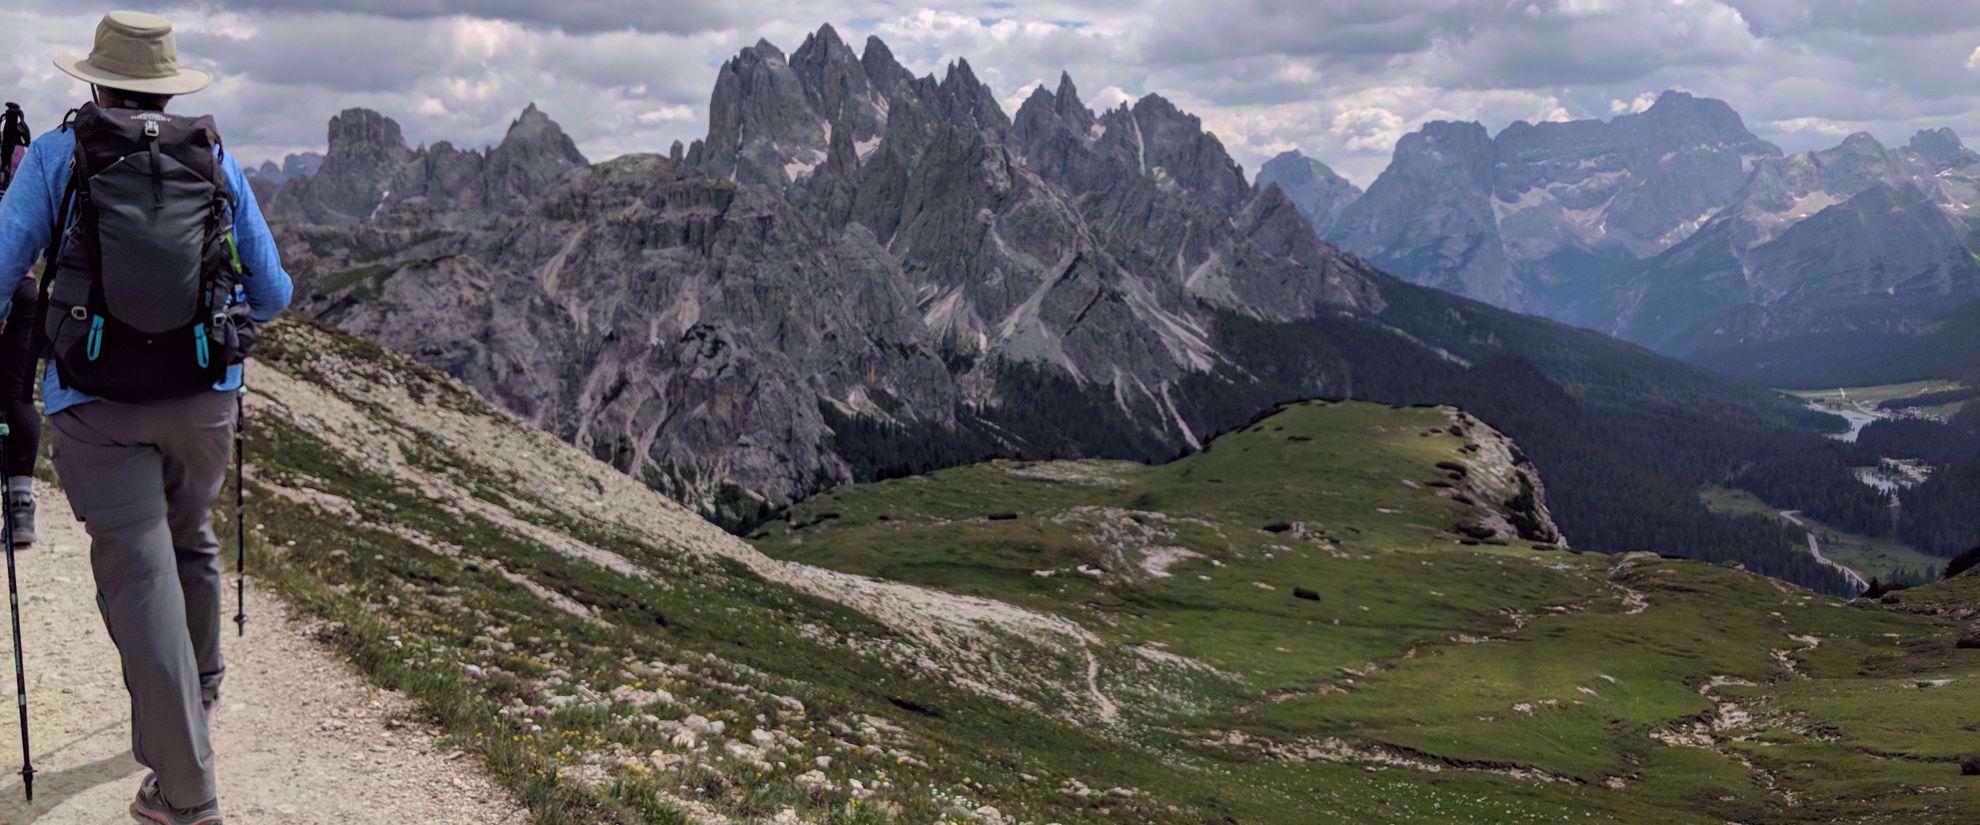 stunning views of italy's rocky alps